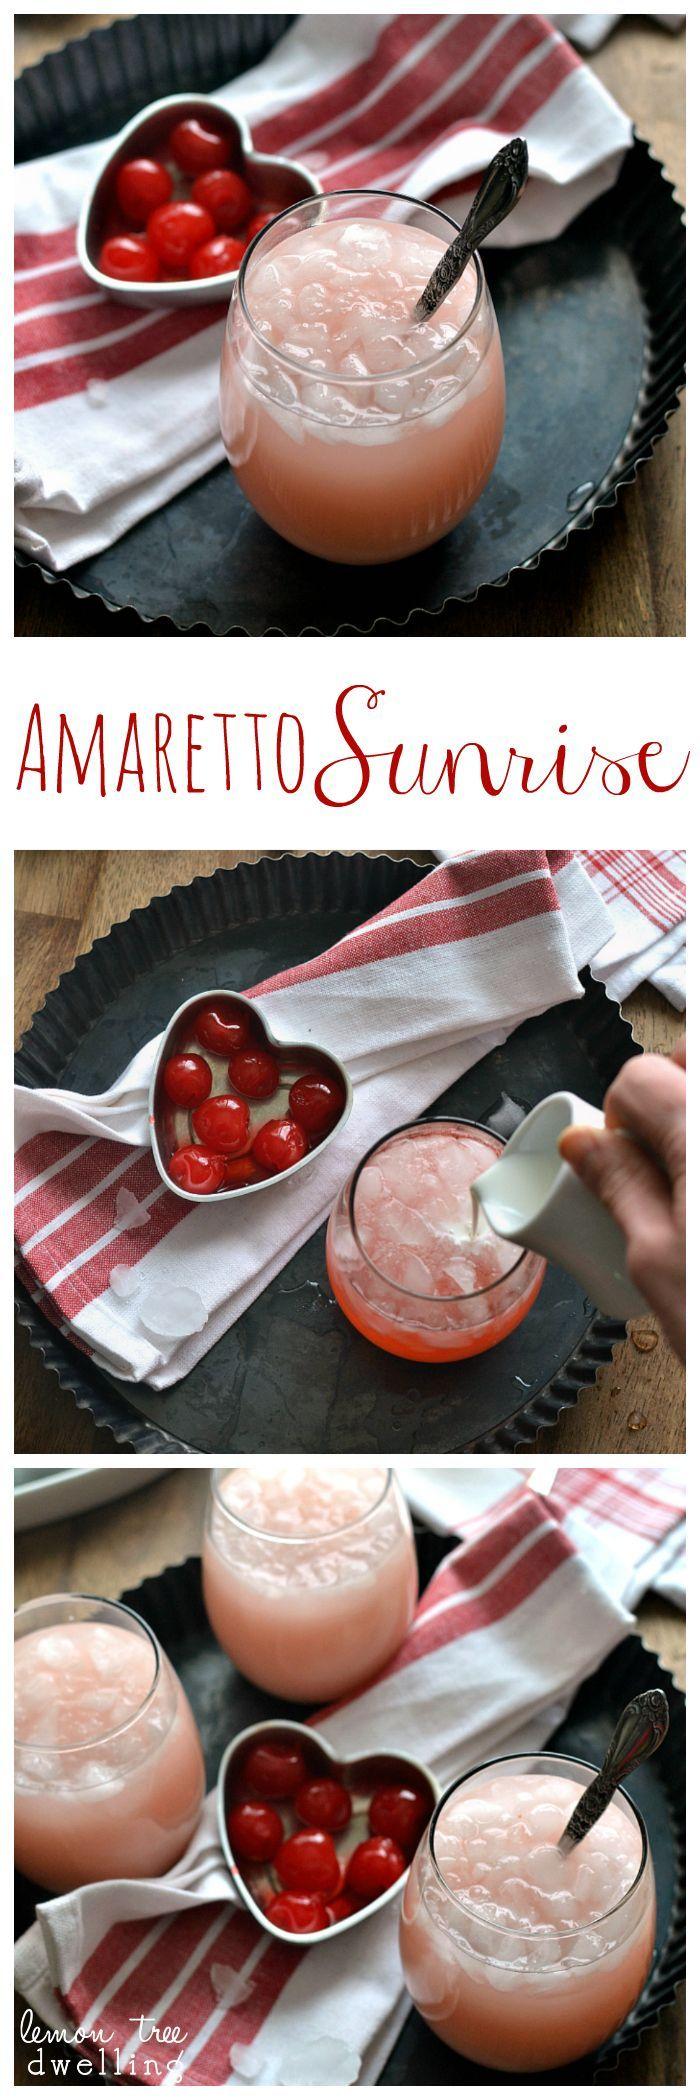 Amaretto Sunrise - a deliciously sweet cocktail made with amaretto, triple sec & grenadine!